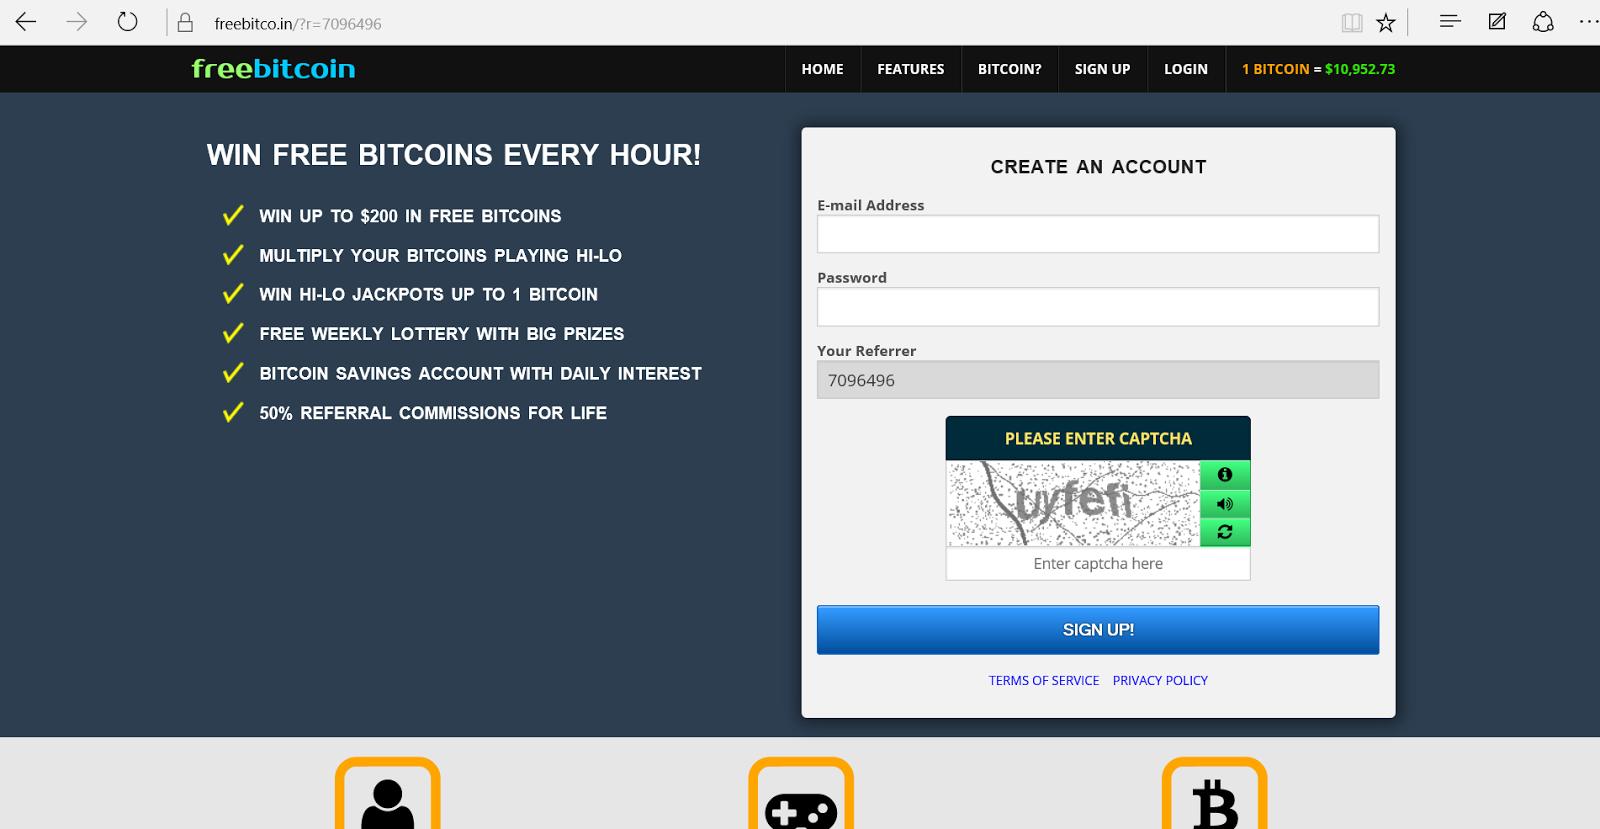 Freebitcoin - CryptoWorld